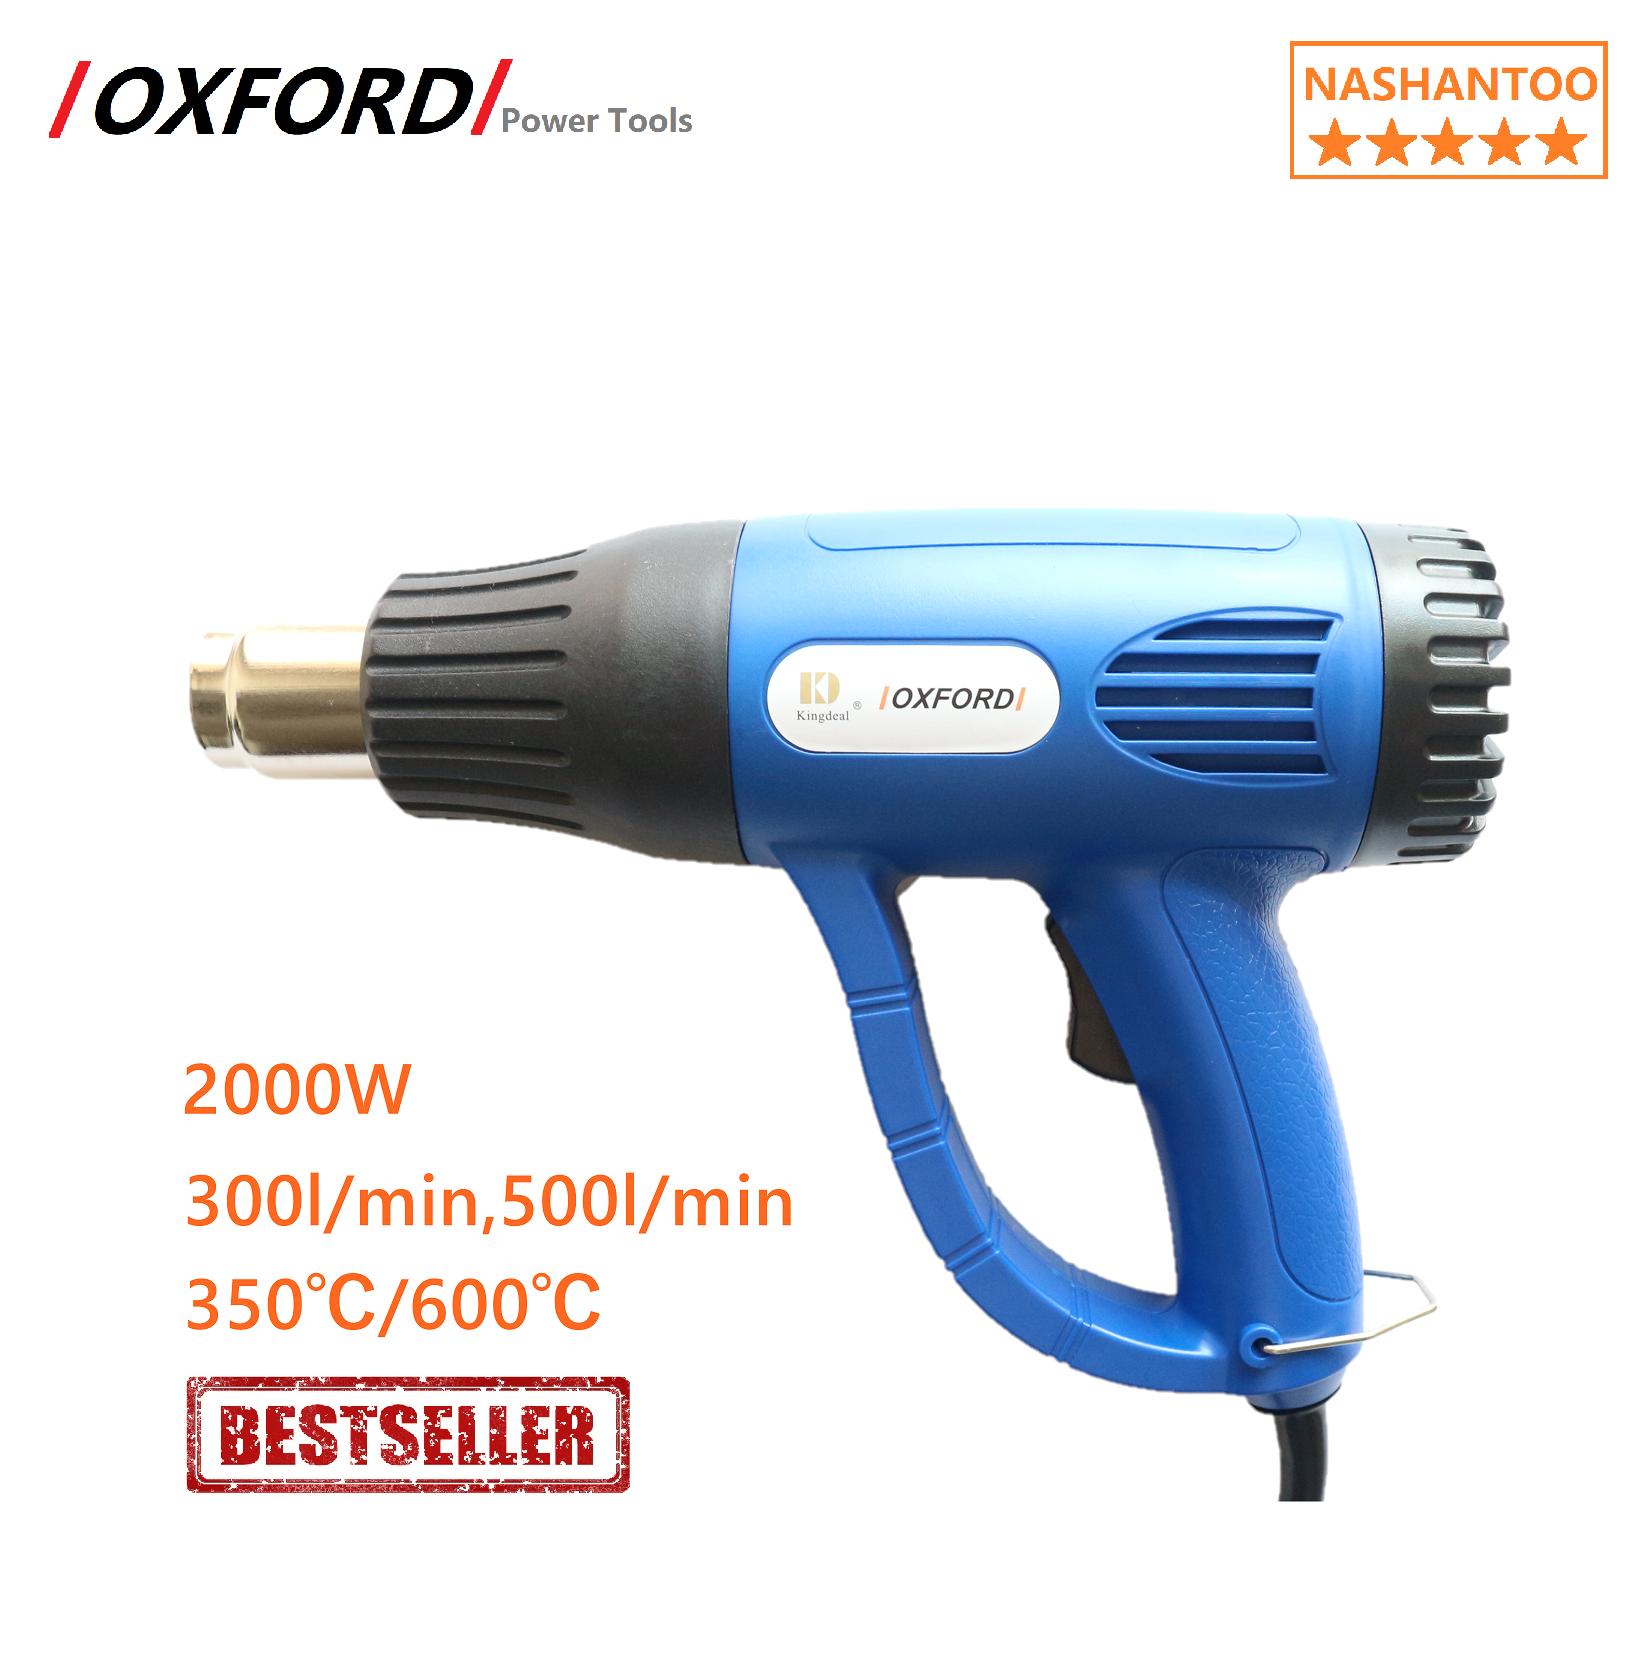 Oxford 2000w Hot Air Electronic Heat Gun Blower With 350 600 2 Power Settings Nashantoo Lazada Ph